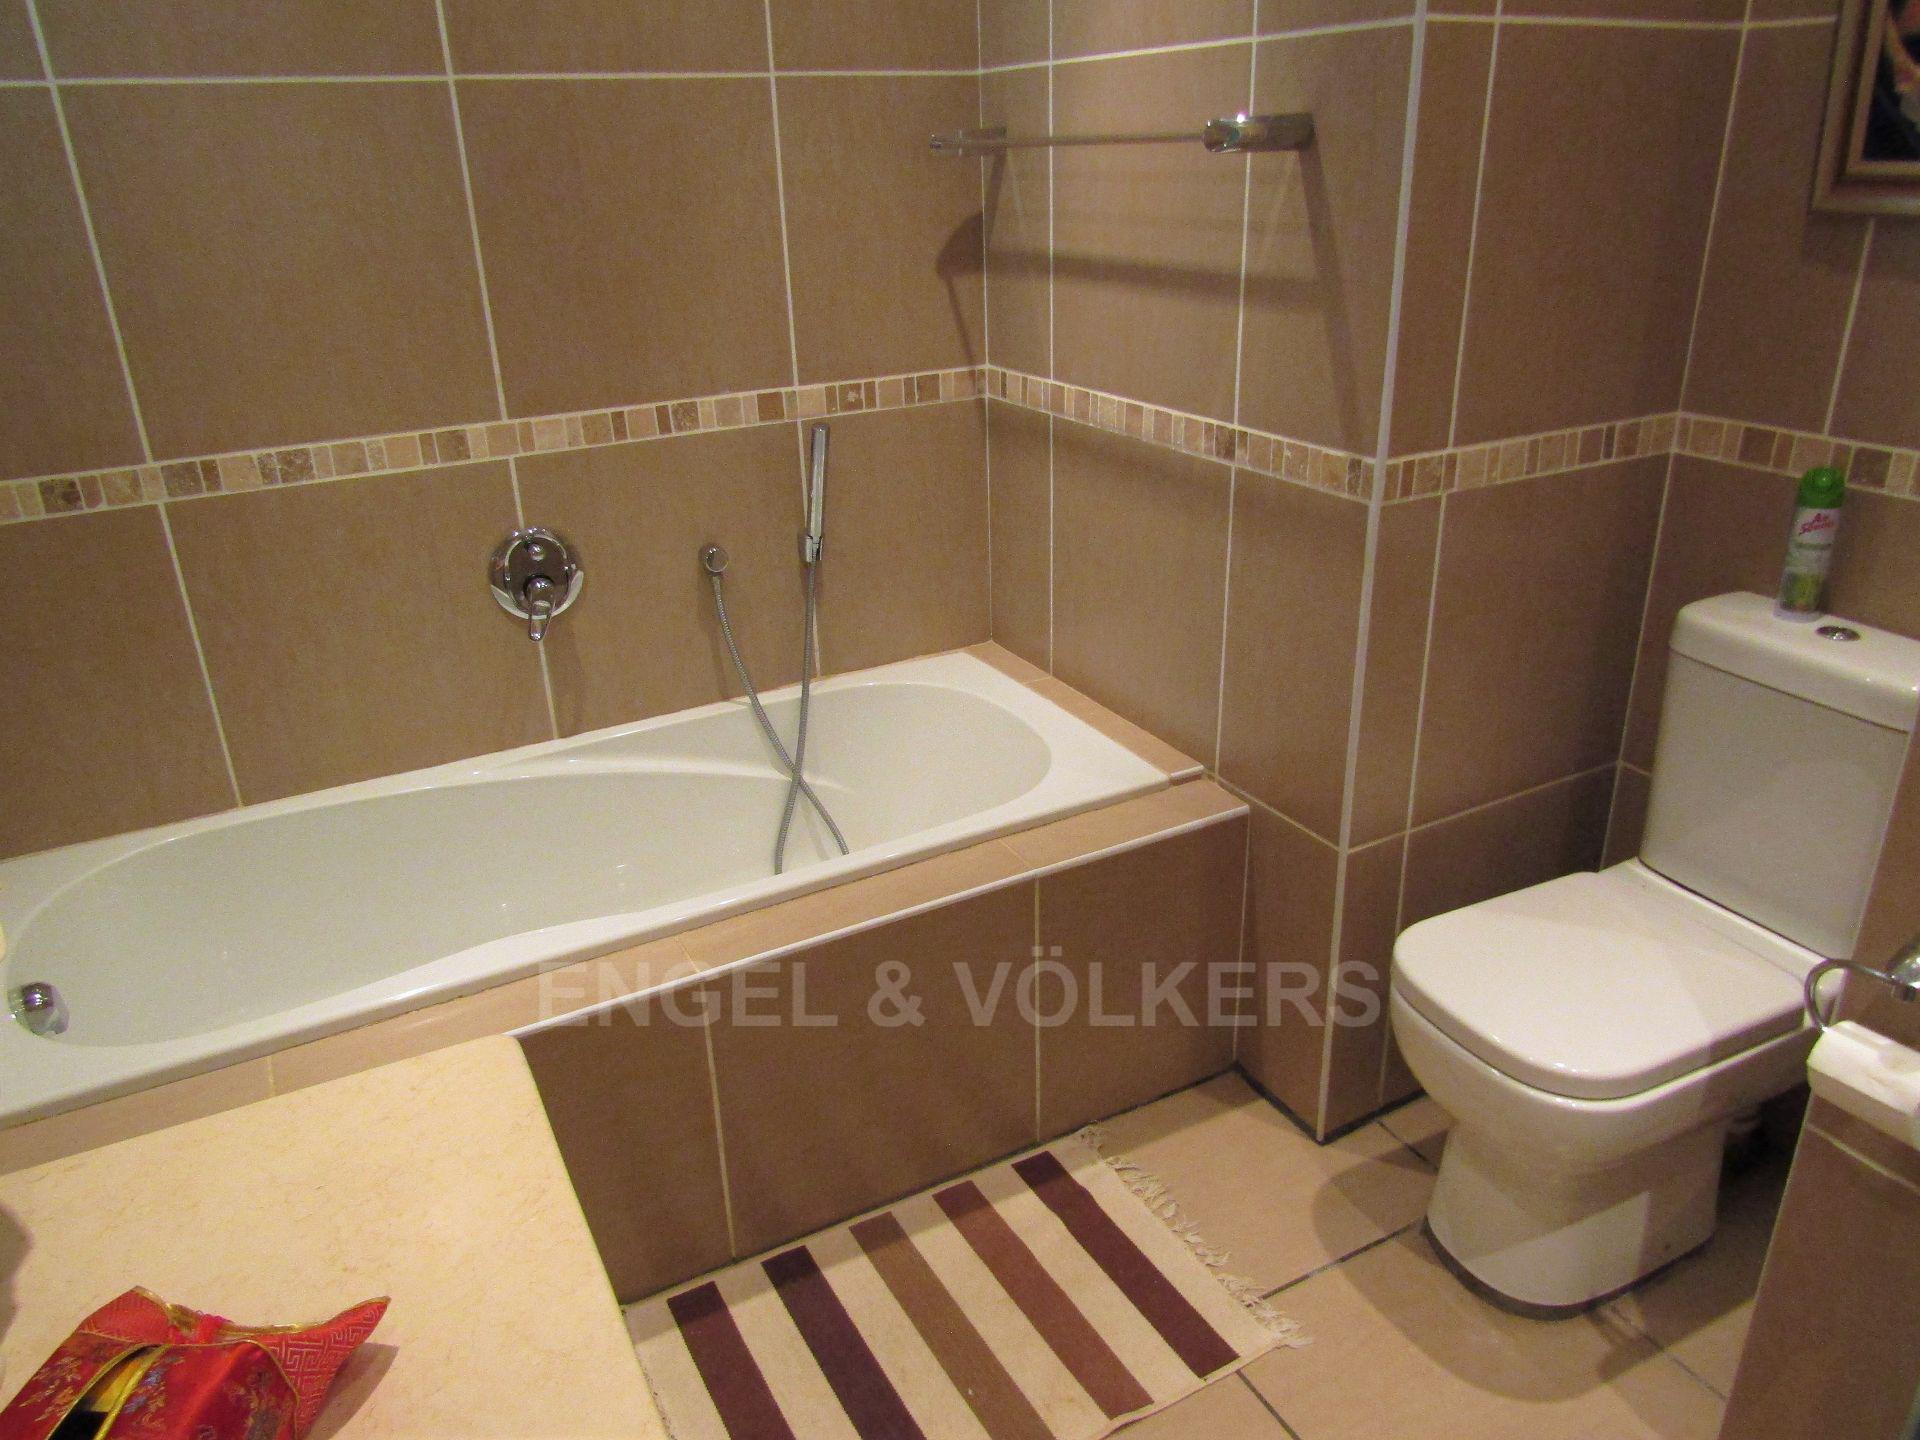 Heilige Akker property for sale. Ref No: 13555391. Picture no 19